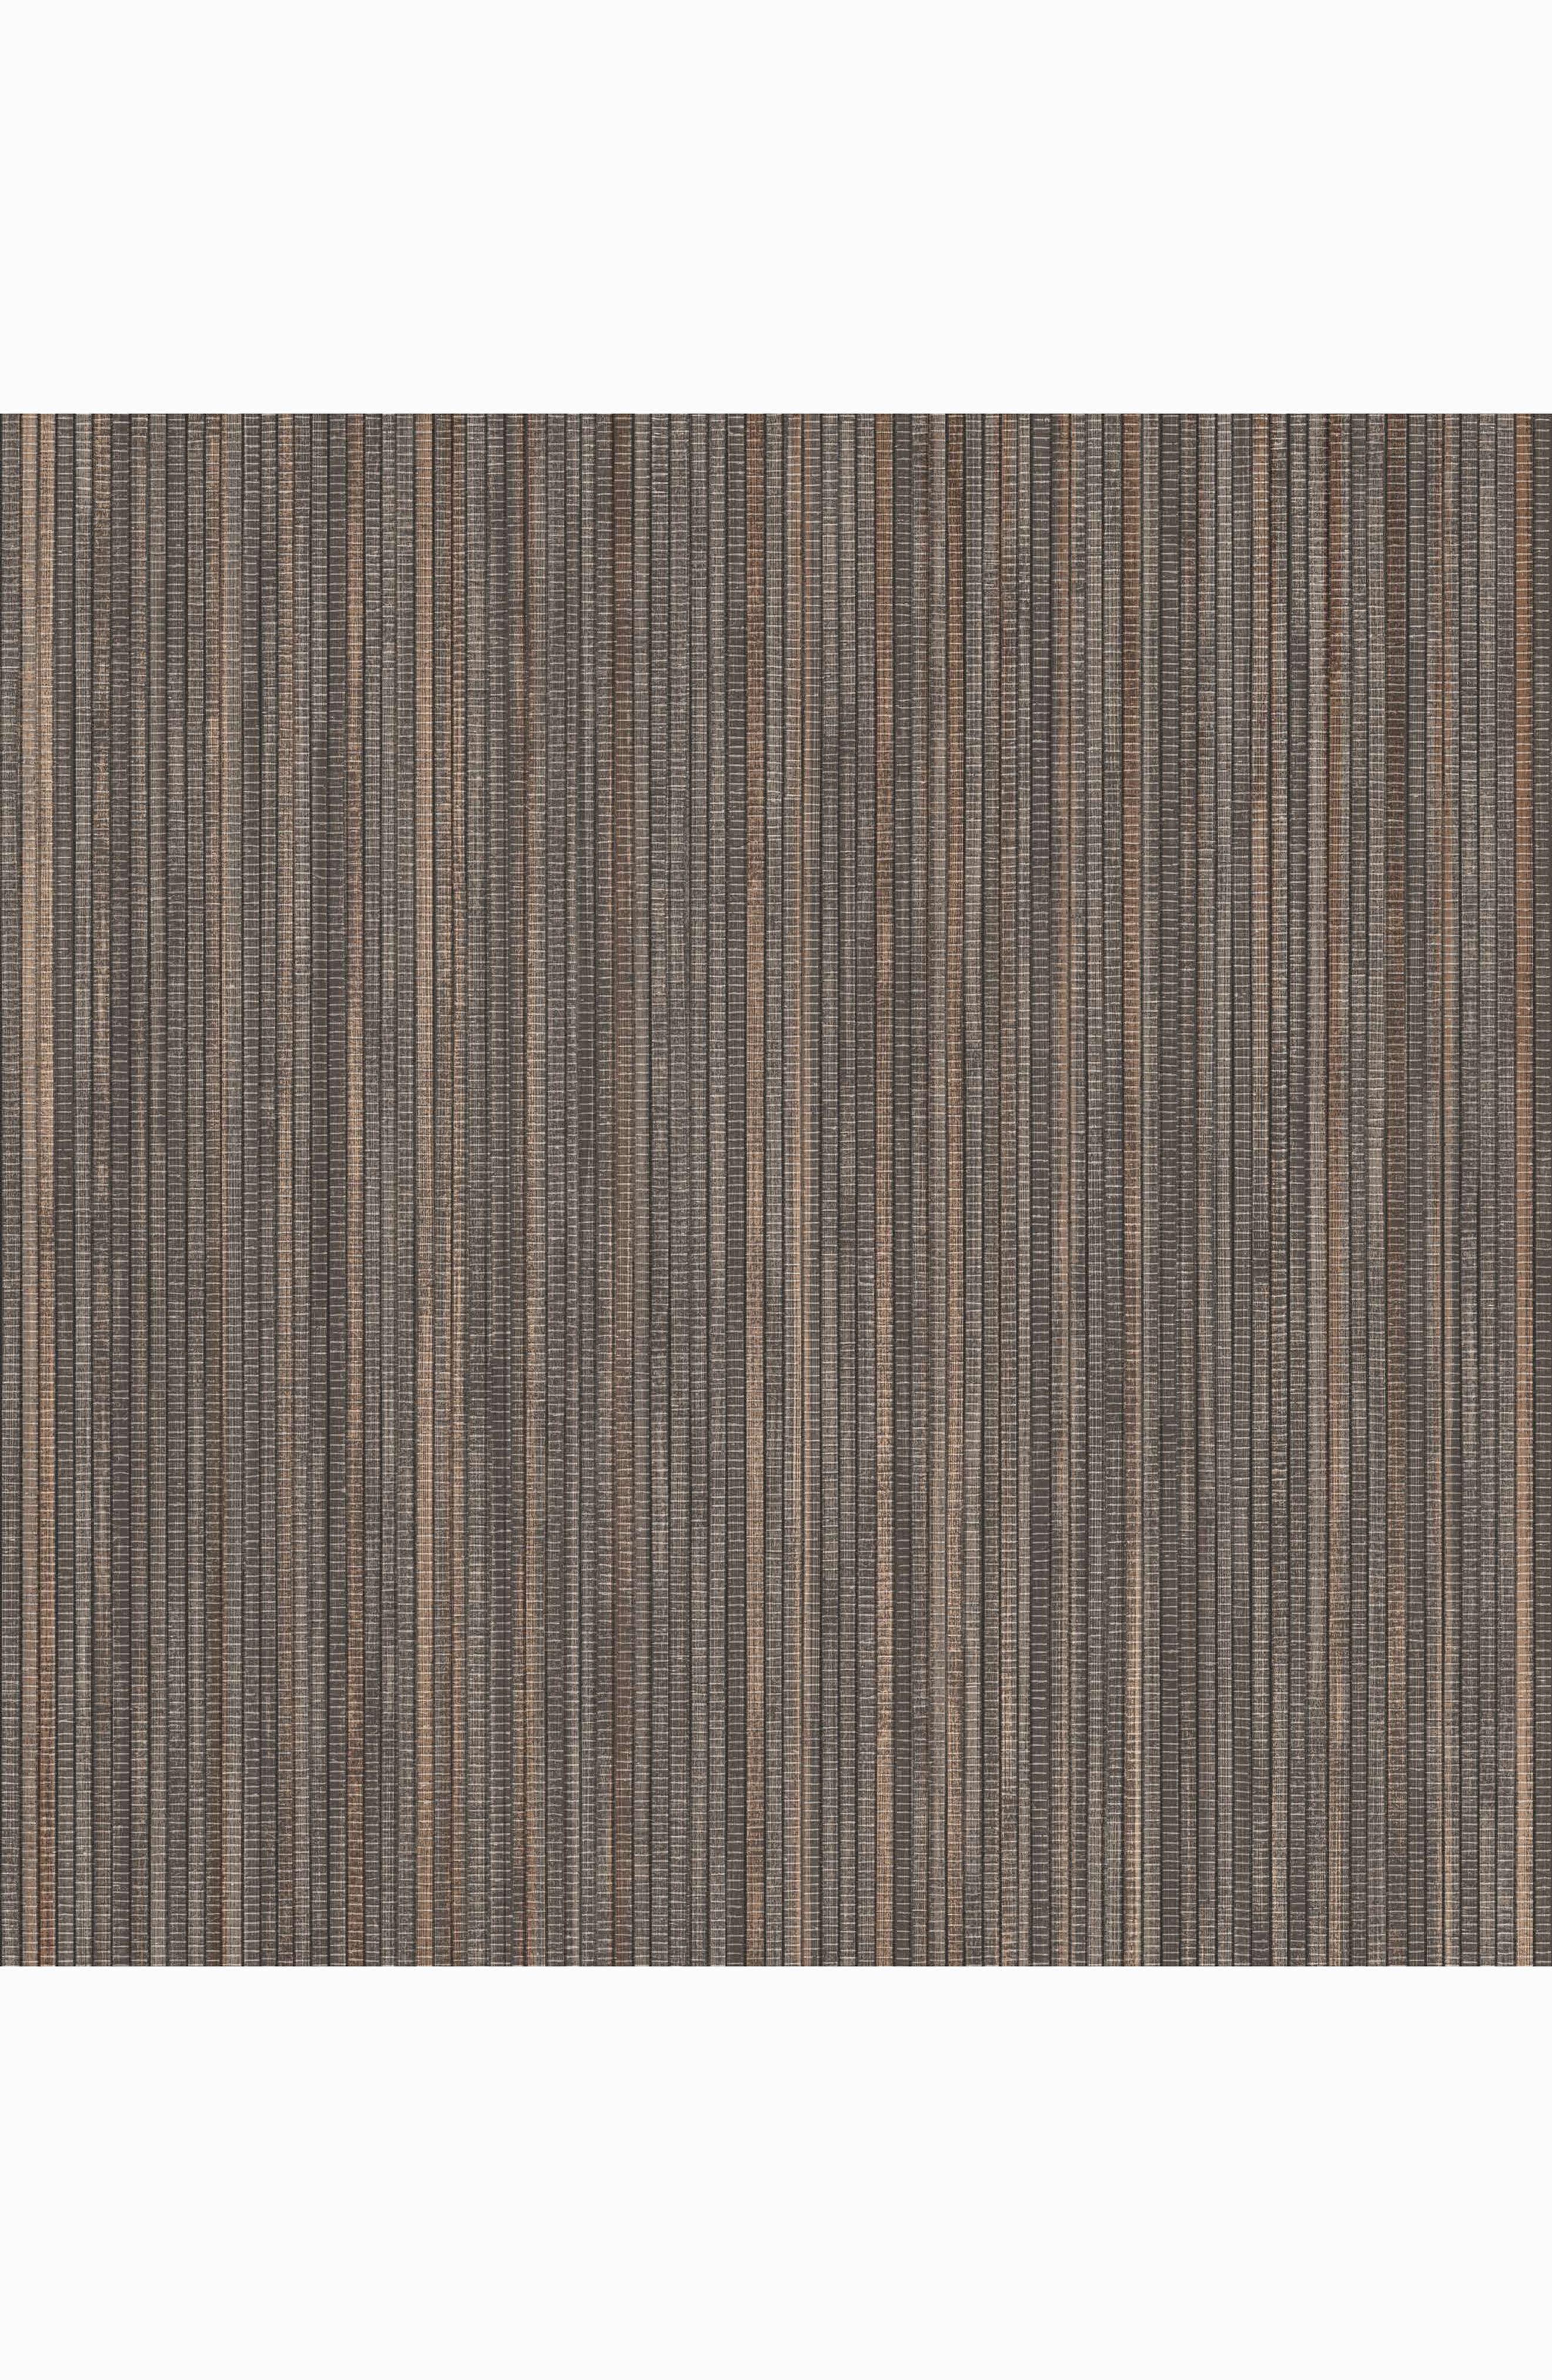 Grasscloth Self-Adhesive Vinyl Wallpaper,                         Main,                         color, Bronze